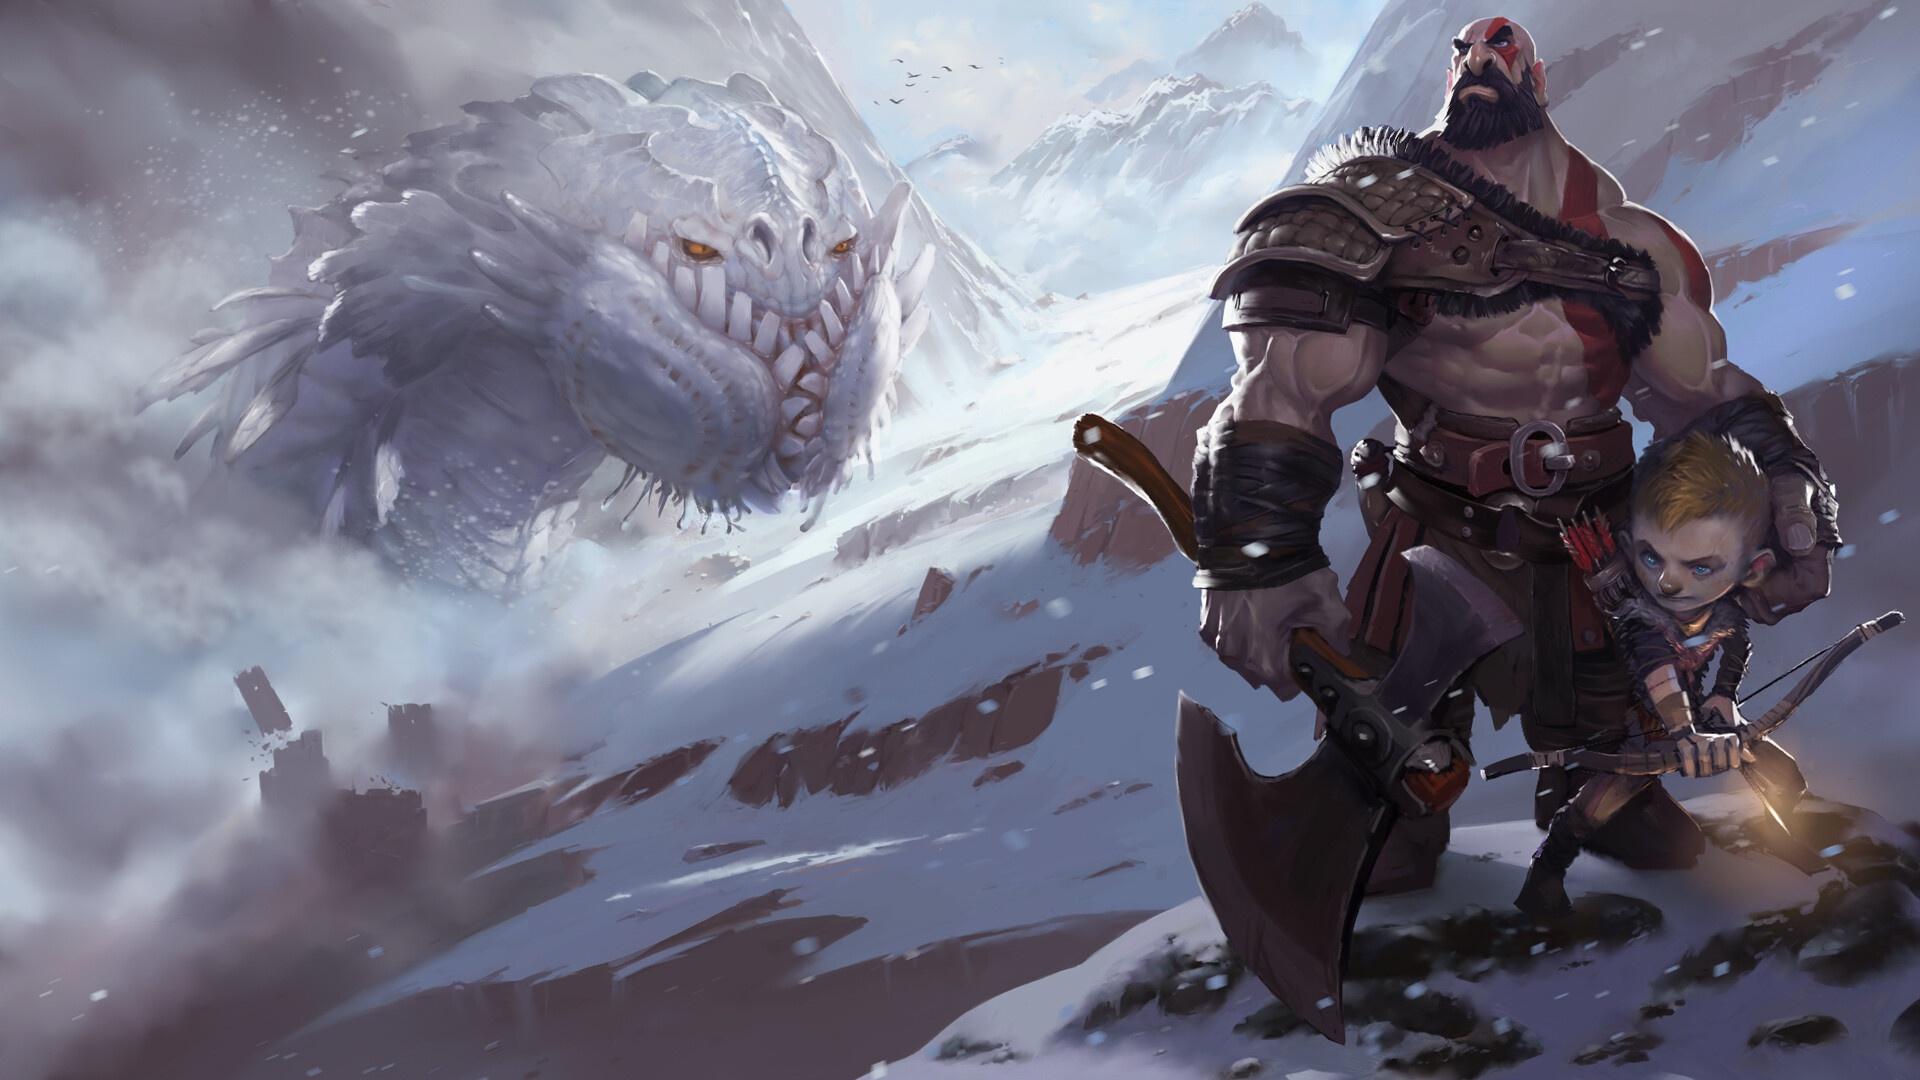 God Of War 2018 Hd Wallpaper Hintergrund 1920x1080